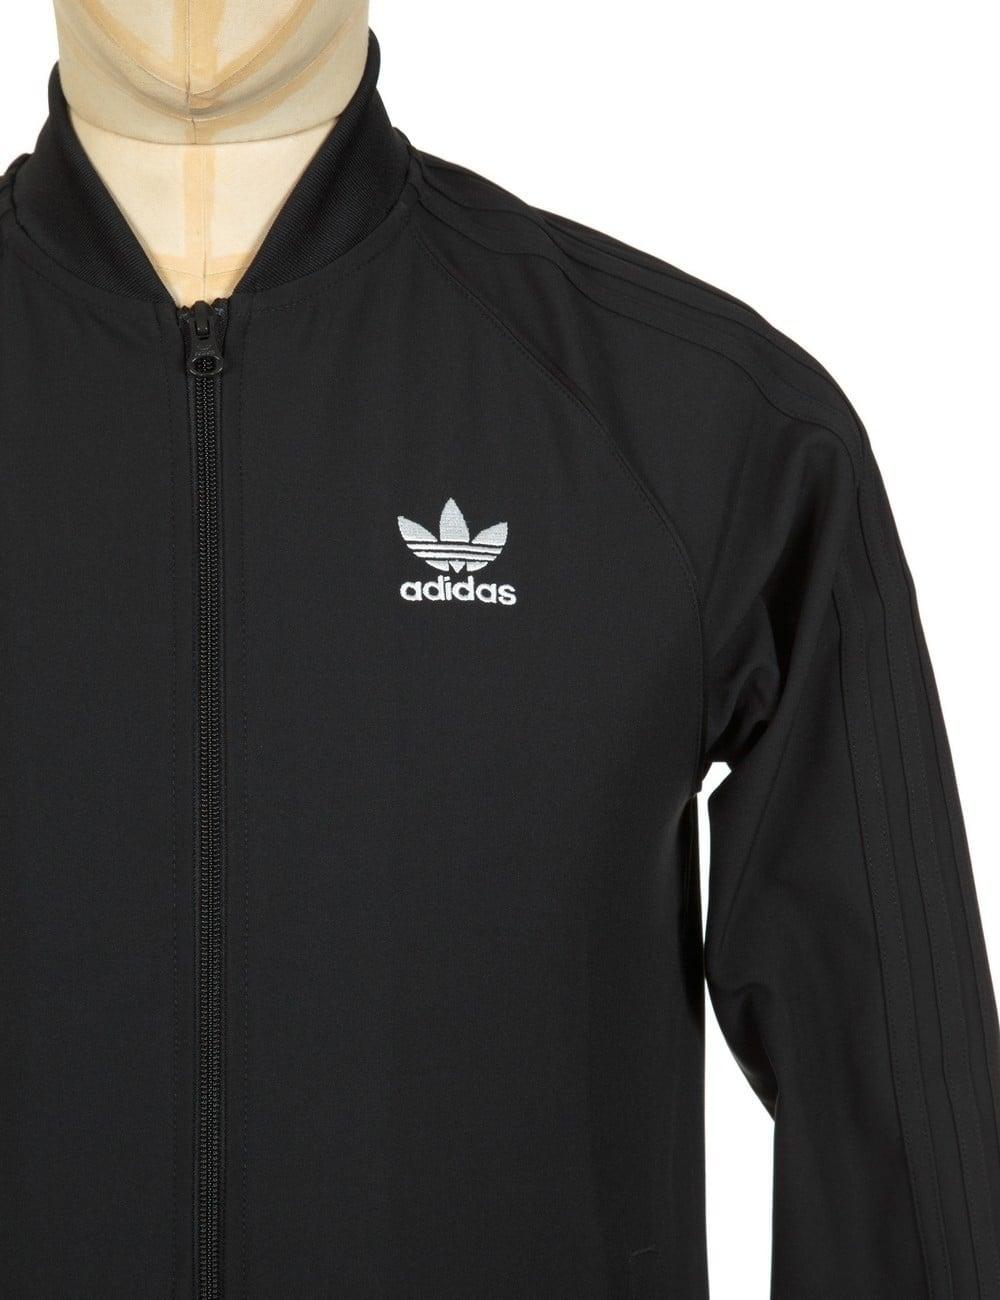 Adidas Originals Superstar 2 0 Track Top Black Black Clothing